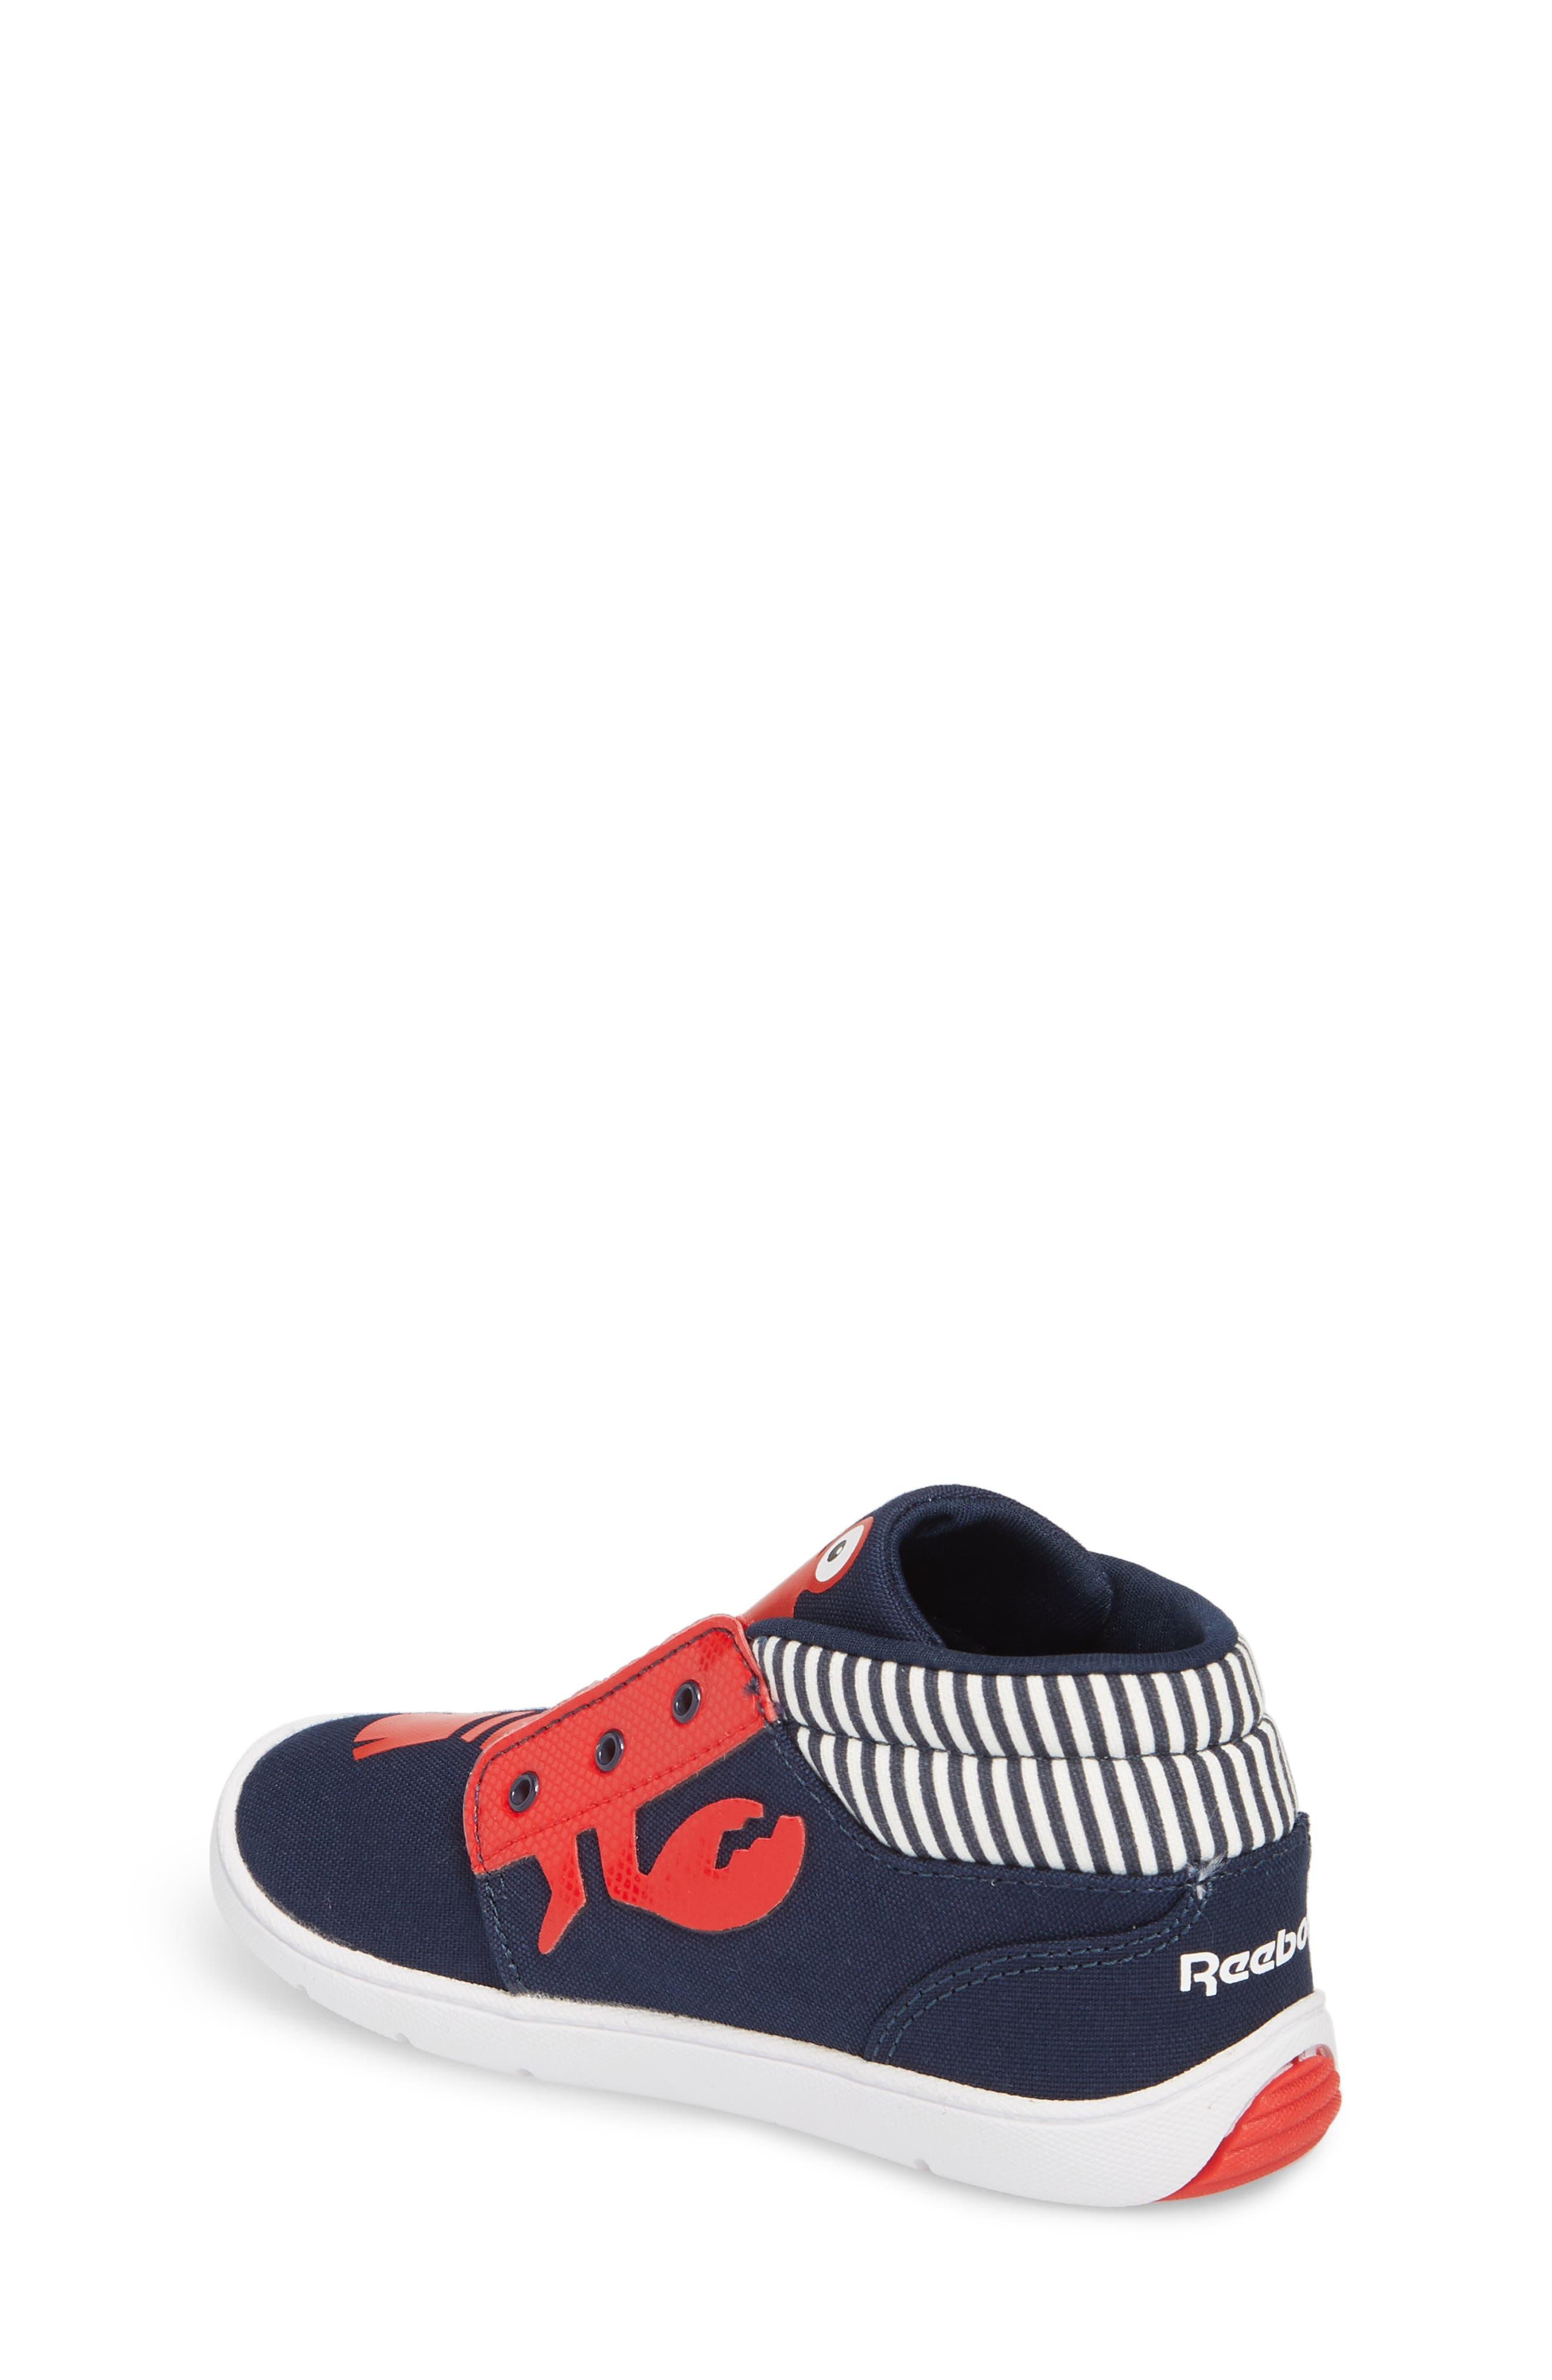 Ventureflex High Top Critter Sneaker,                             Alternate thumbnail 2, color,                             400